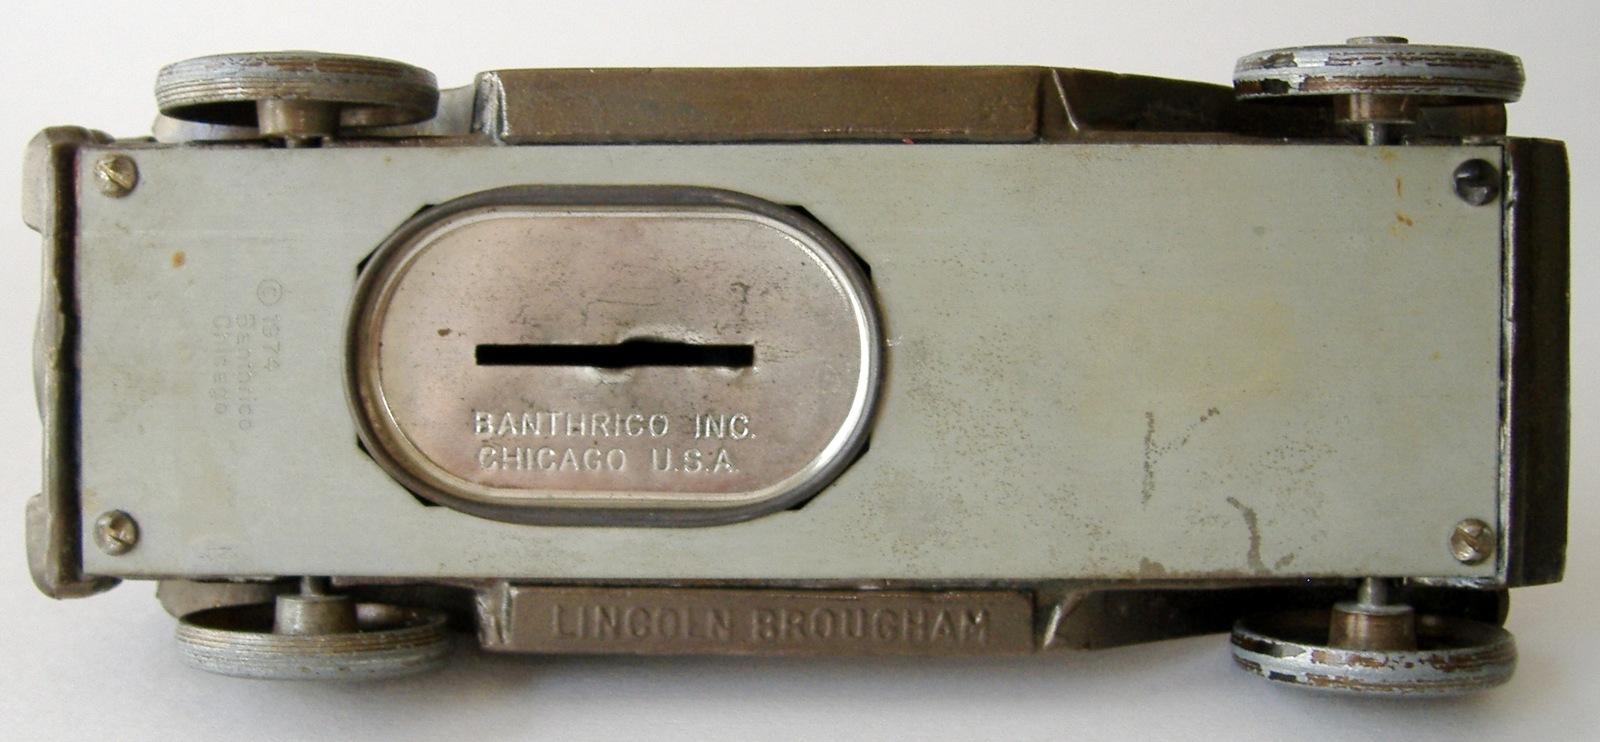 Vintage 1927 Lincoln Brougham Banthrico Car Coin Bank Metal Automobile